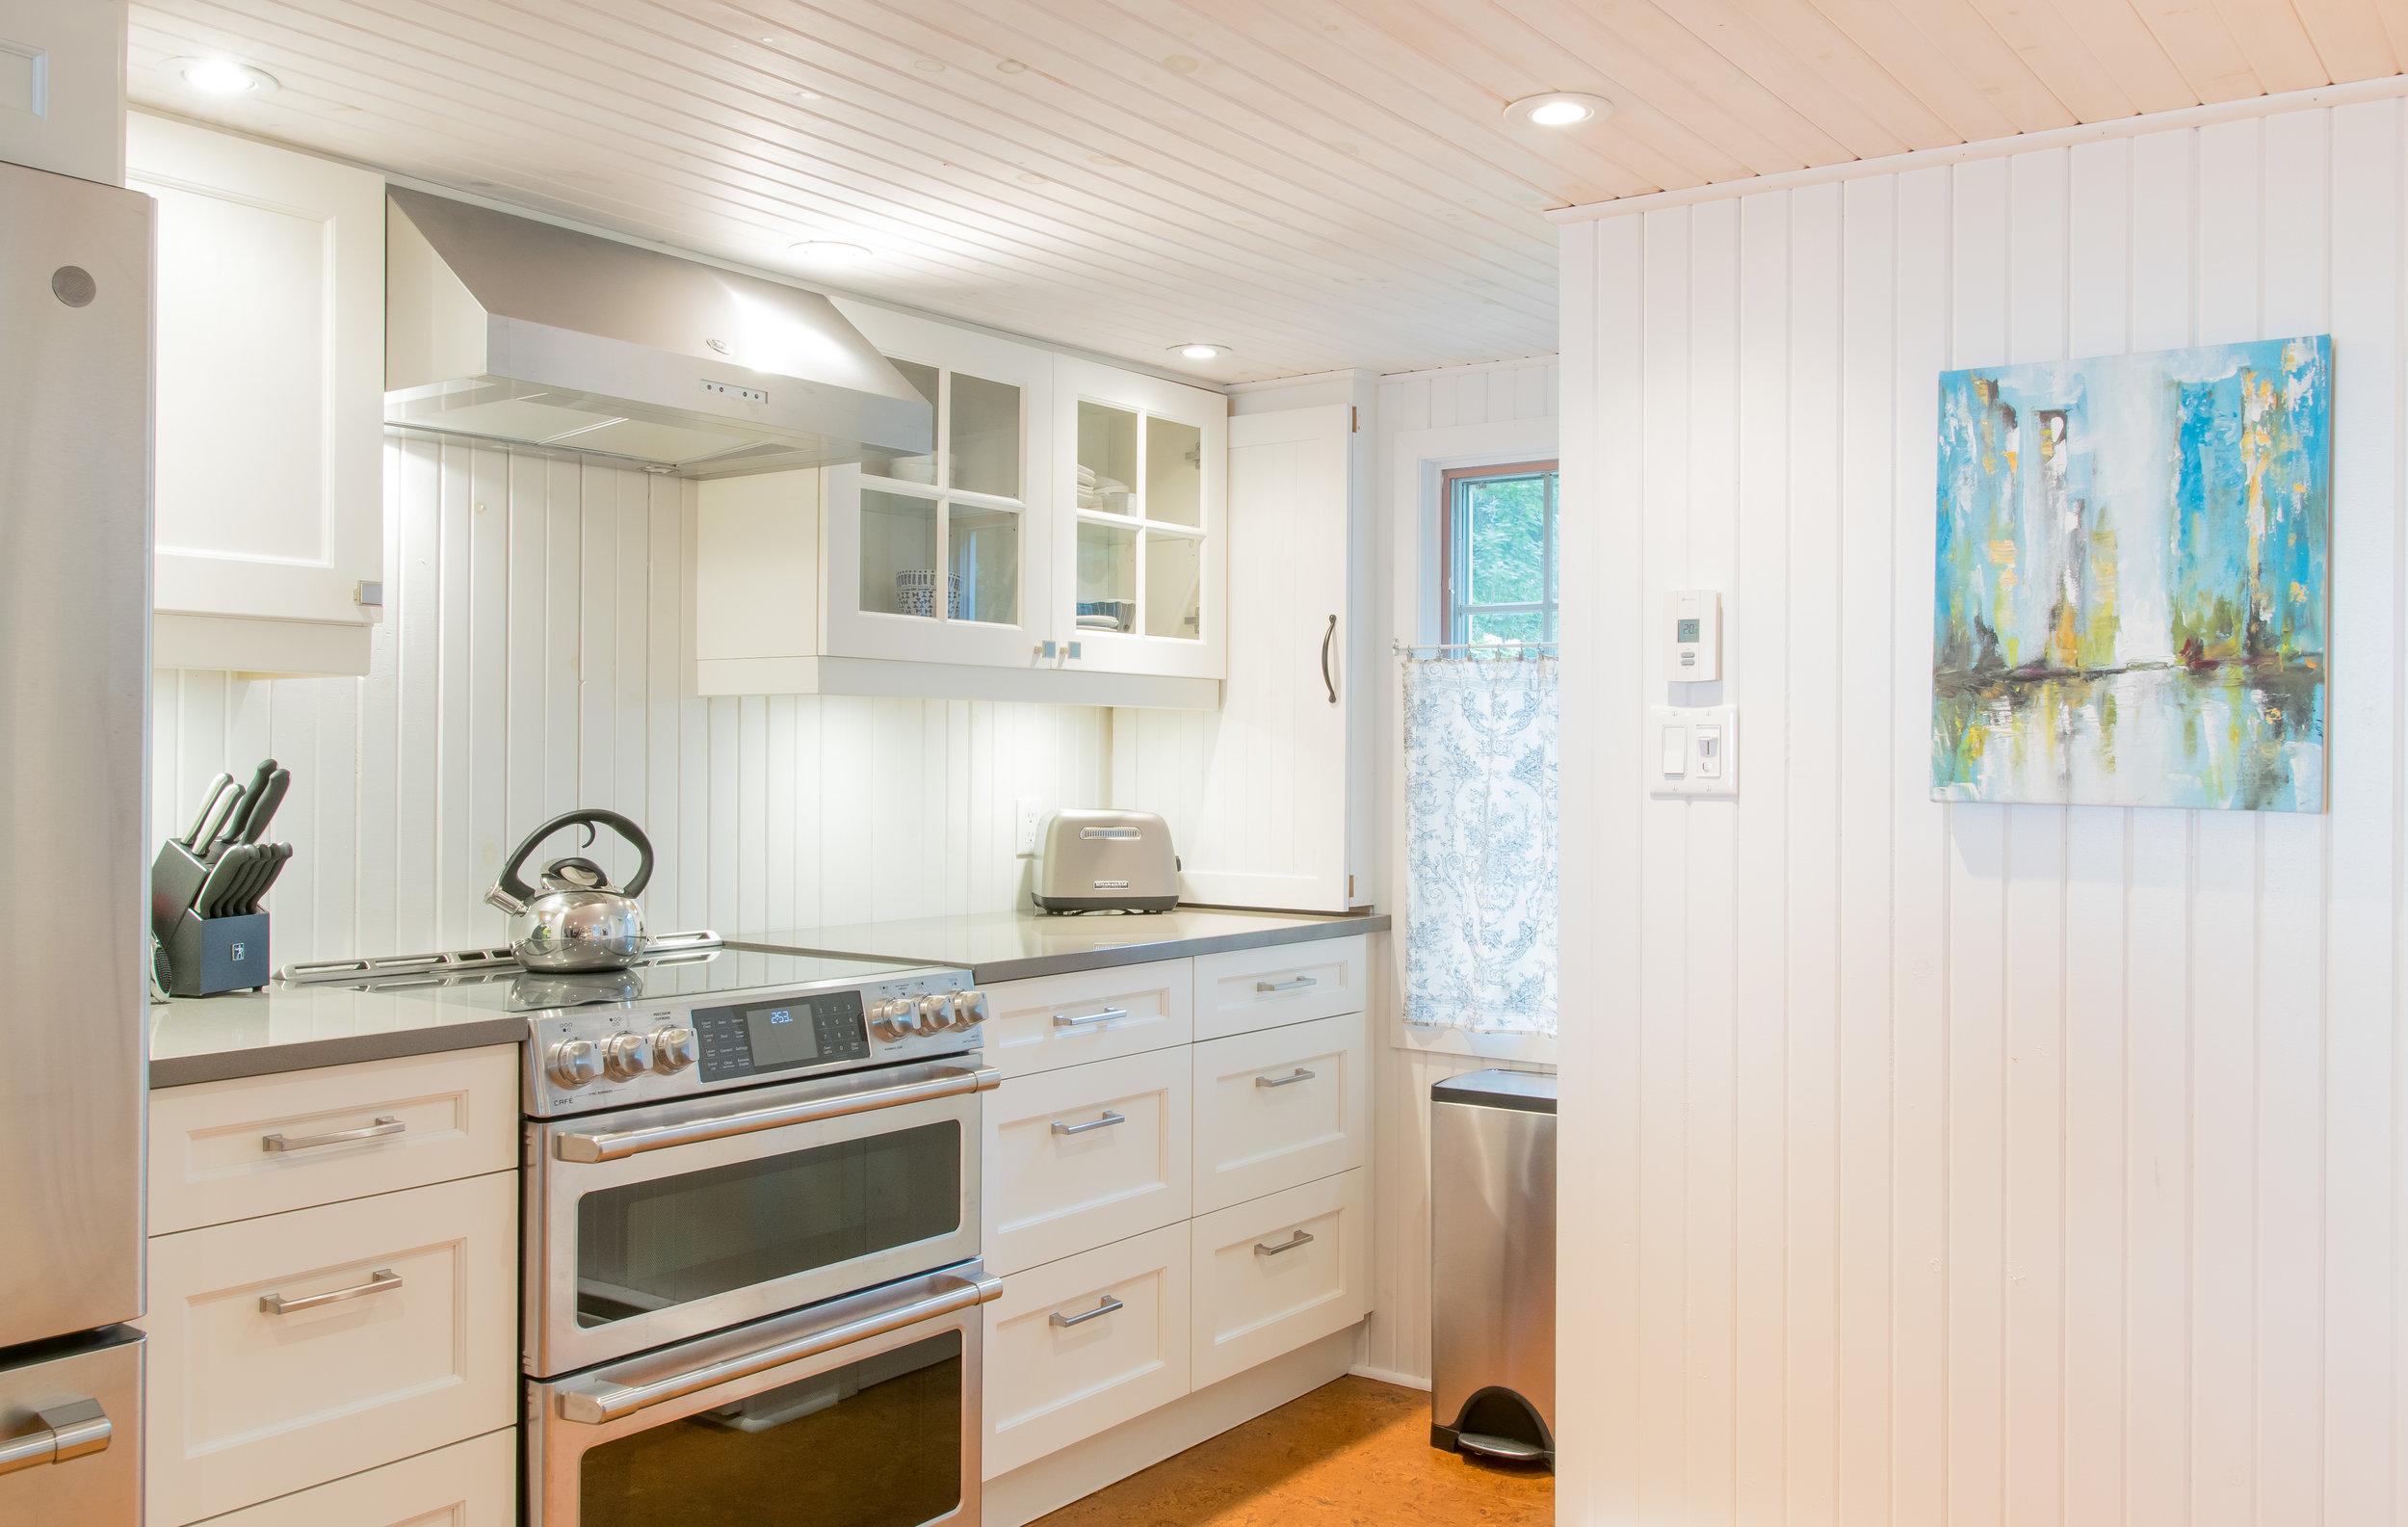 A White Country Kitchen